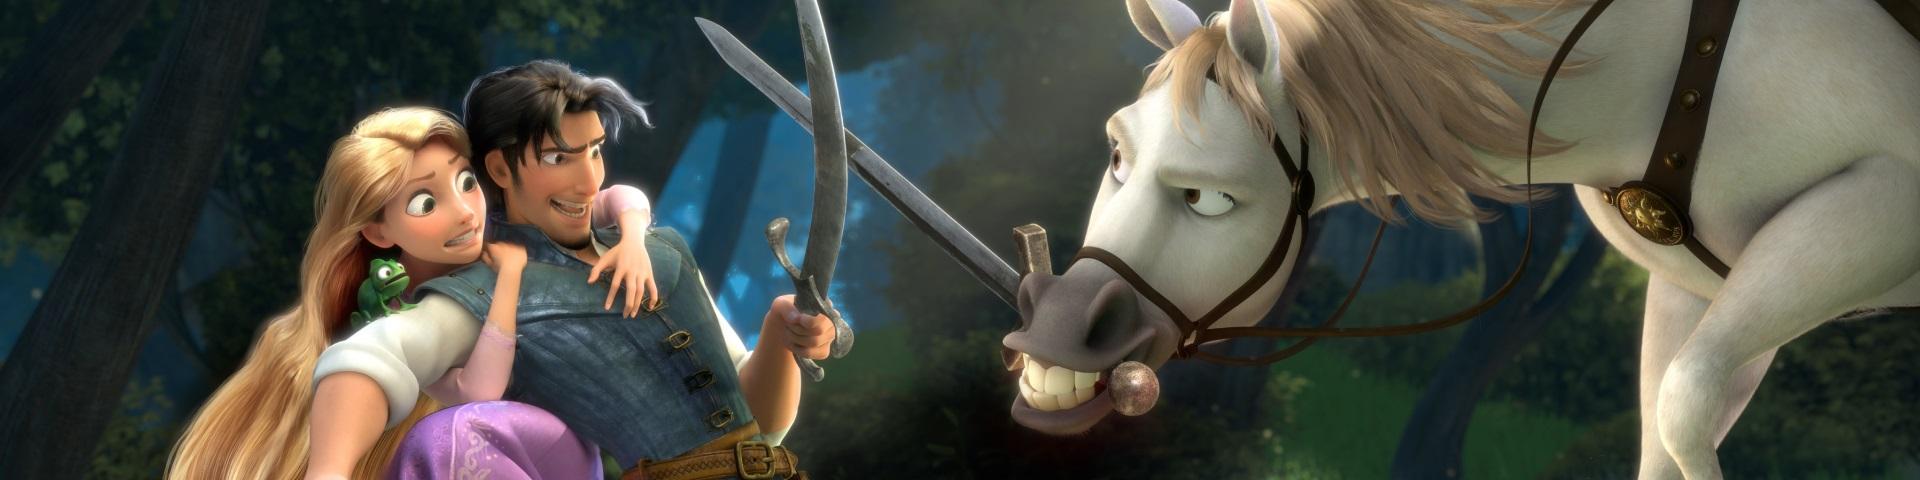 Park Your Cinema Kids | 8 animation που μπορείτε να απολαύσετε με τα παιδιά στο Ξέφωτο του ΚΠΙΣΝ